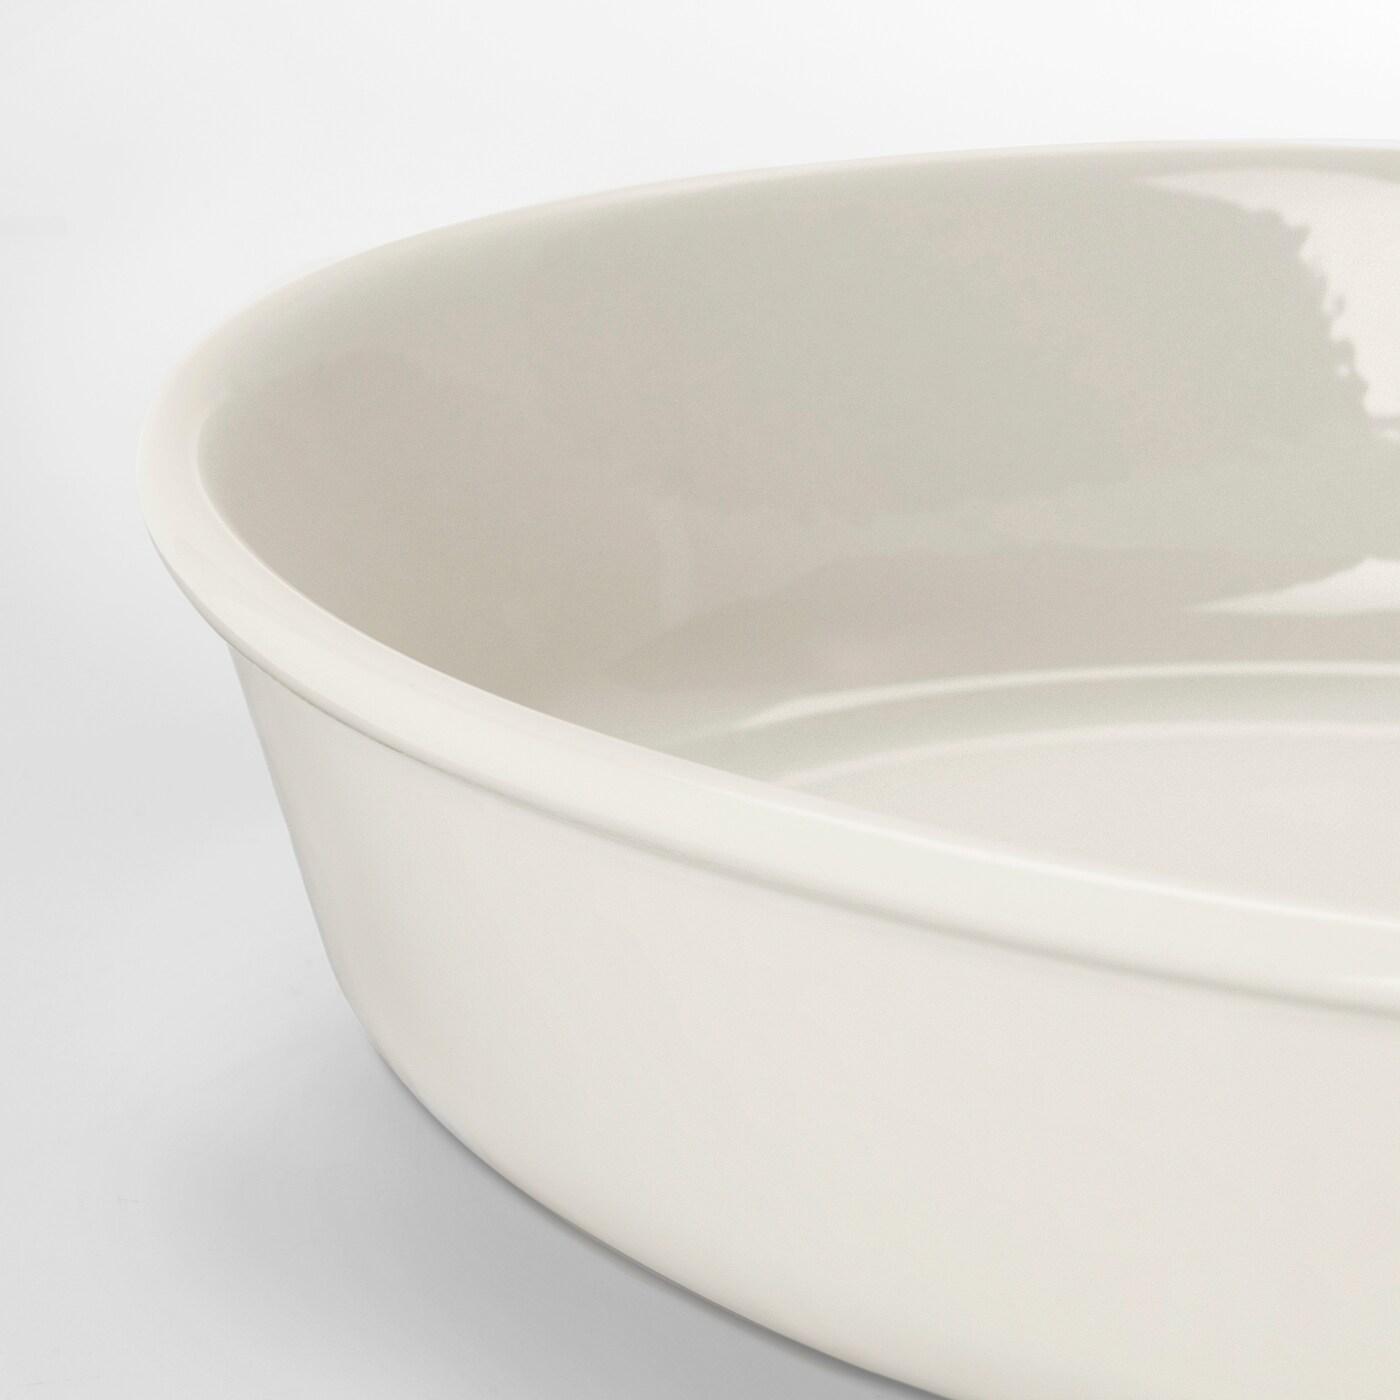 Oval IKEA 202.893.16 Vardagen Oven Dish Off-White